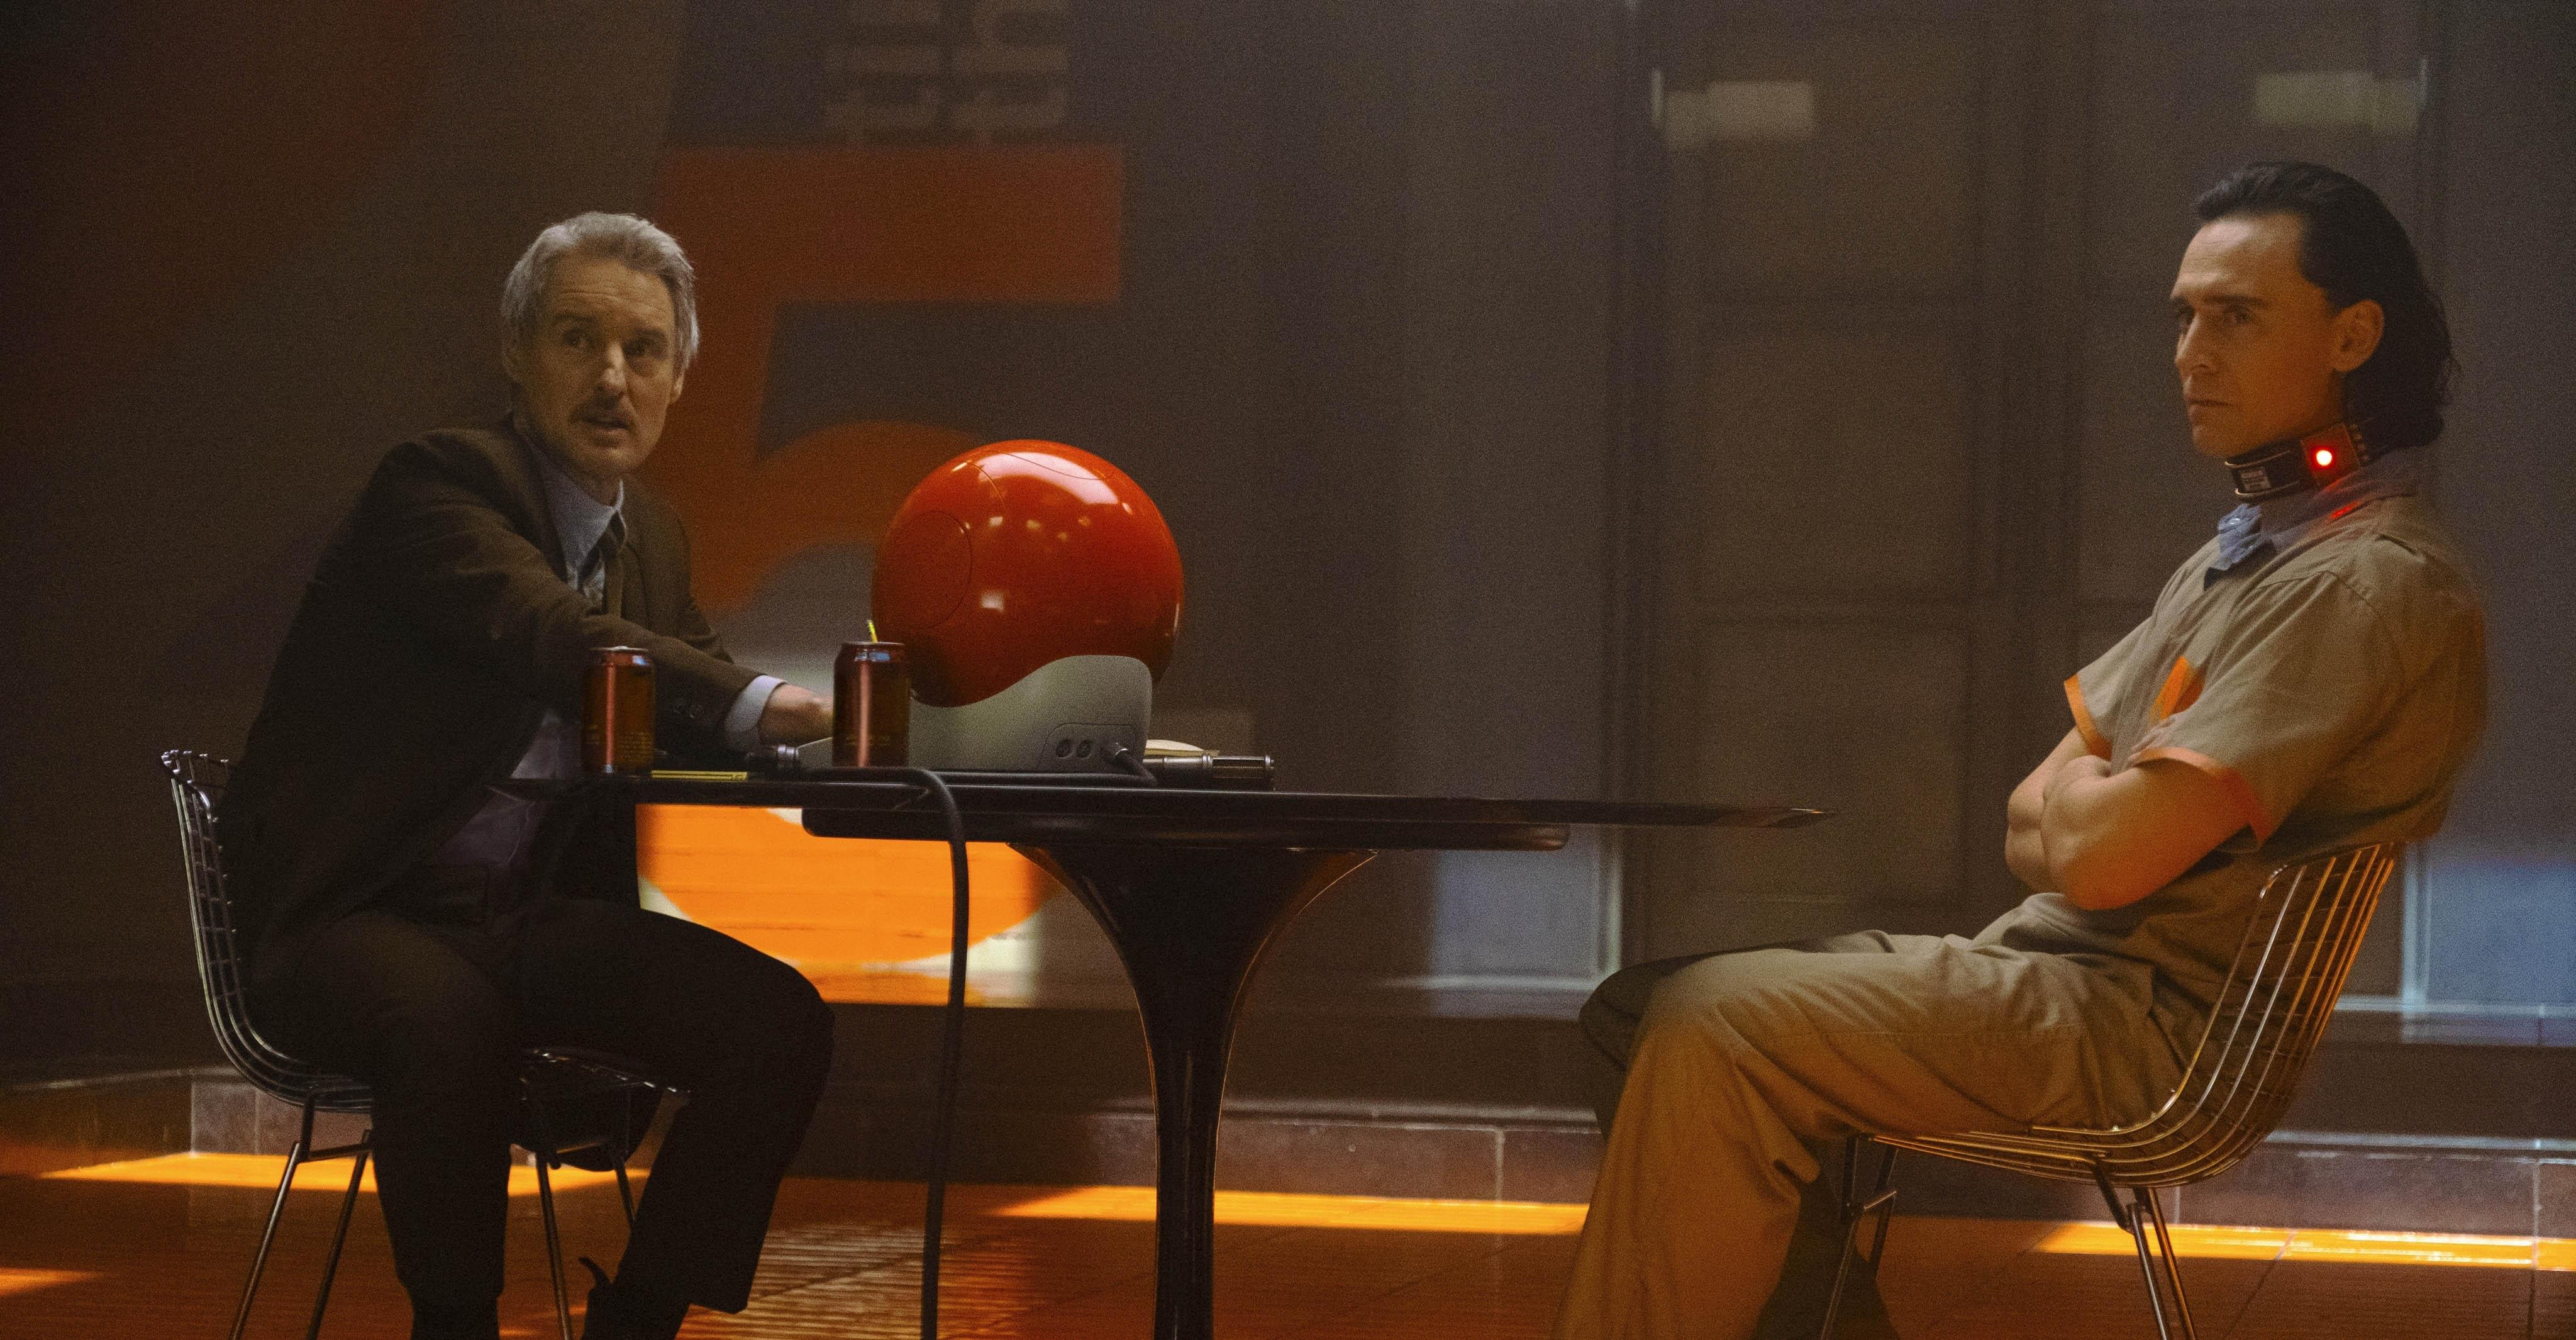 Owen Wilson as Mobius M. Mobius and Tom Hiddleston as Loki, God of Mischief.